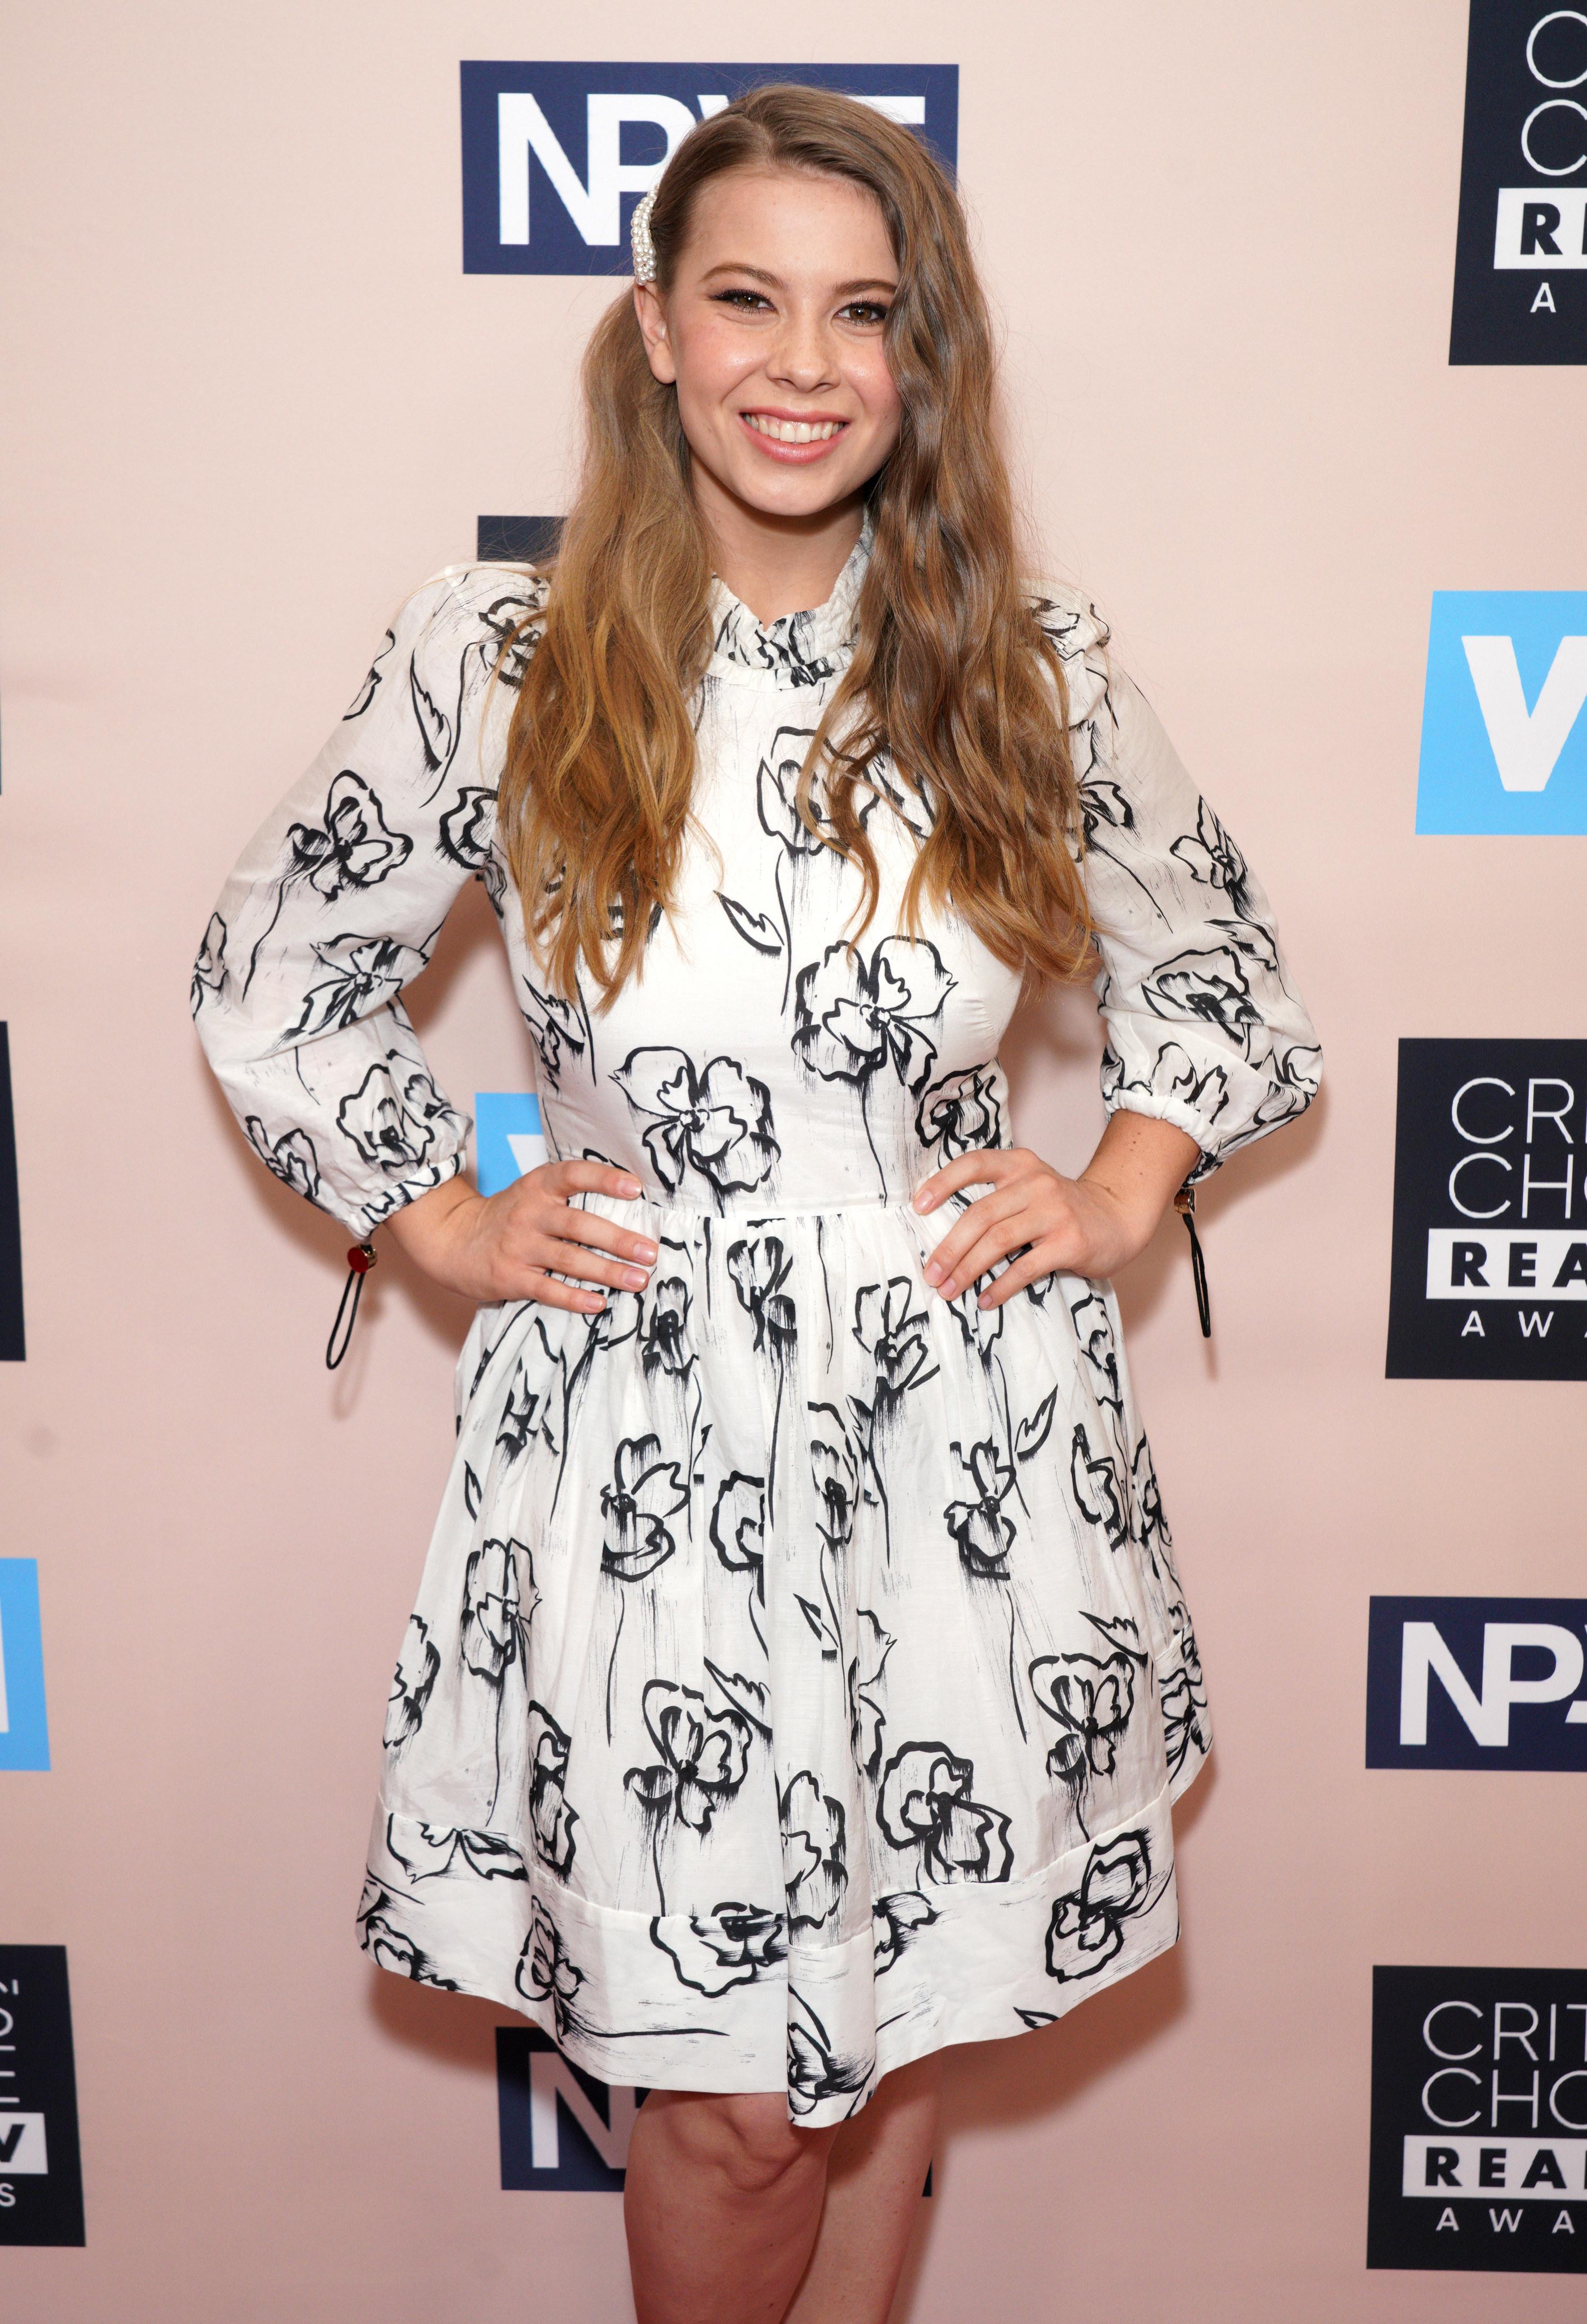 Bindi Irwin attending the Critics' Choice Real TV Awards